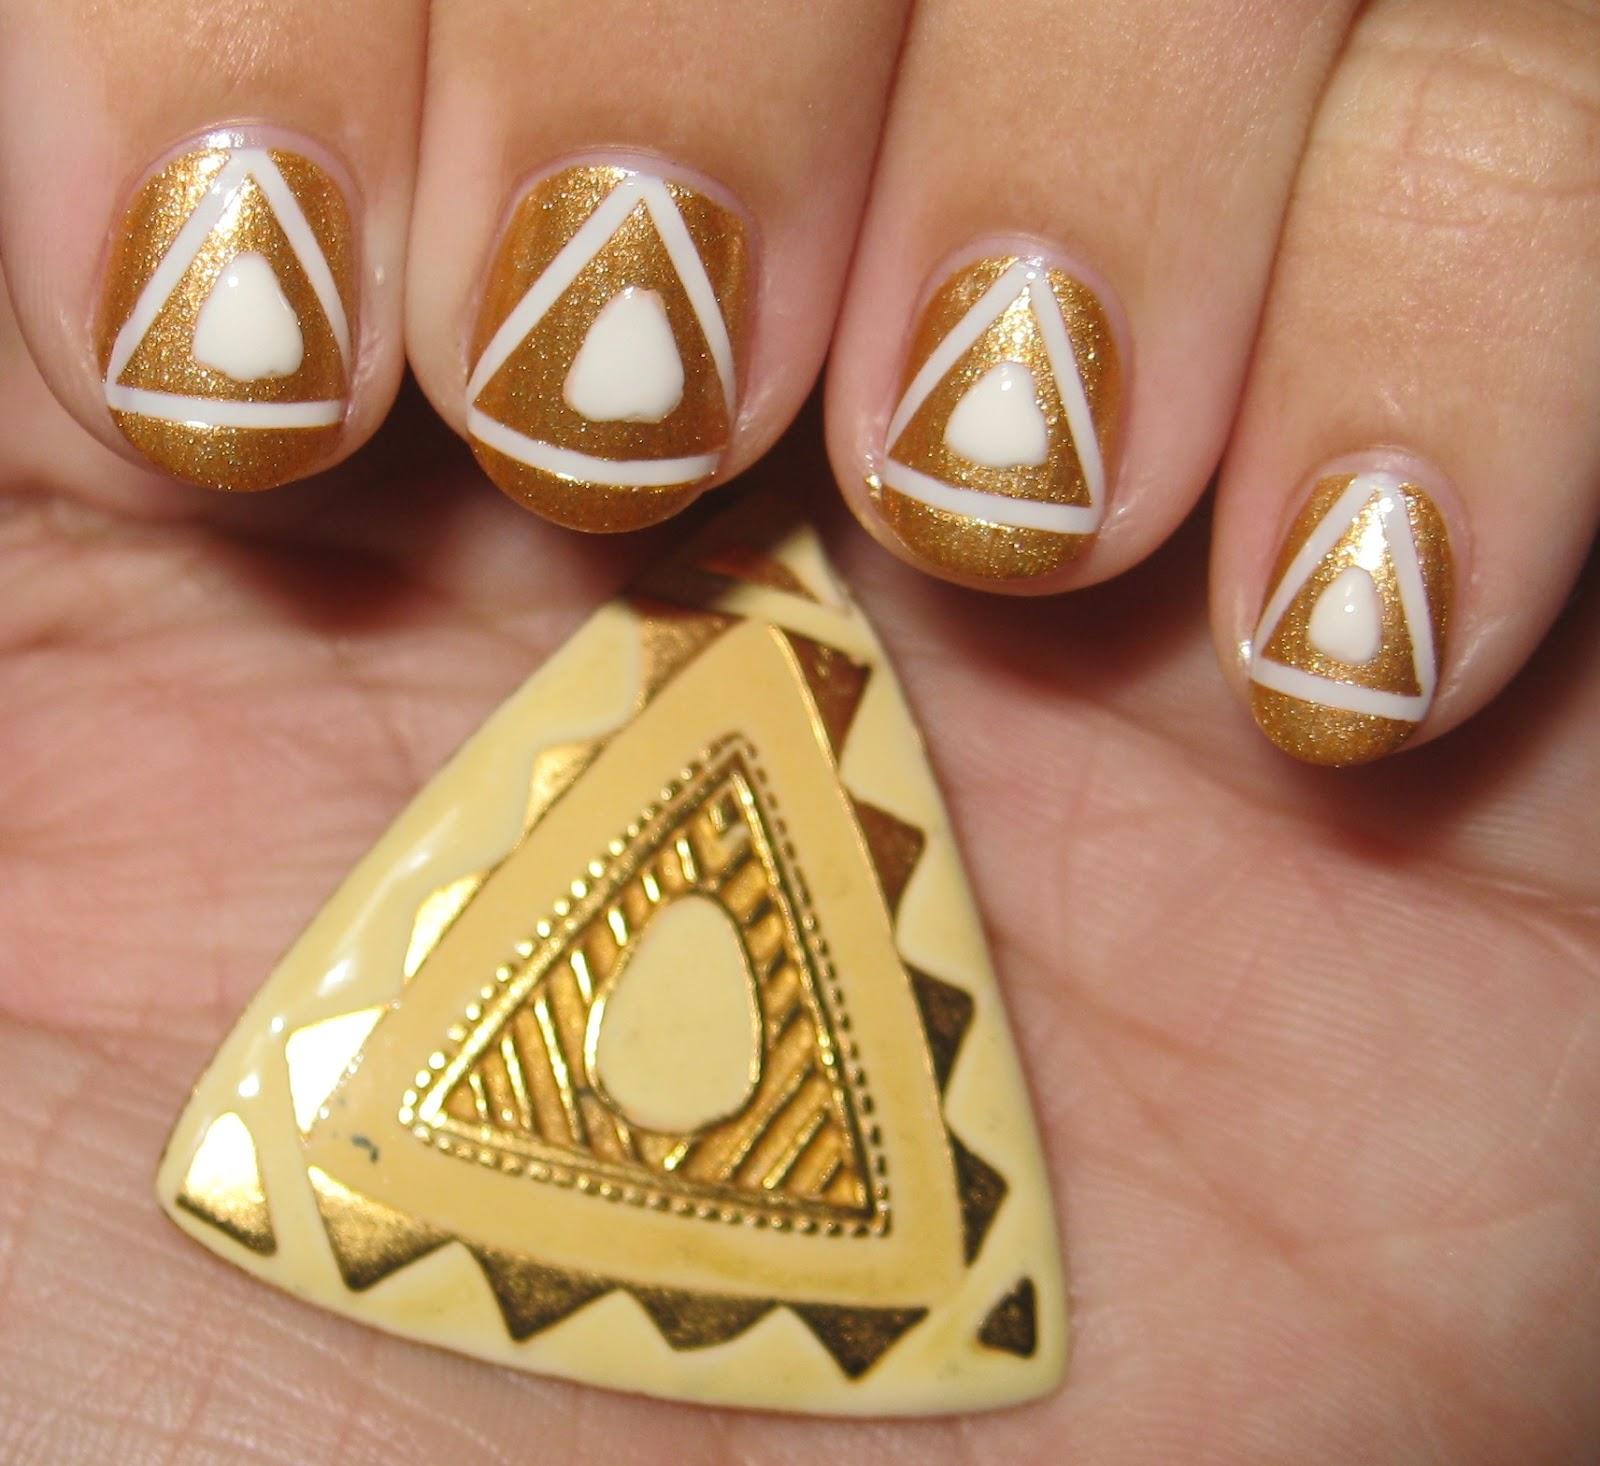 80's Earrings nail art #1